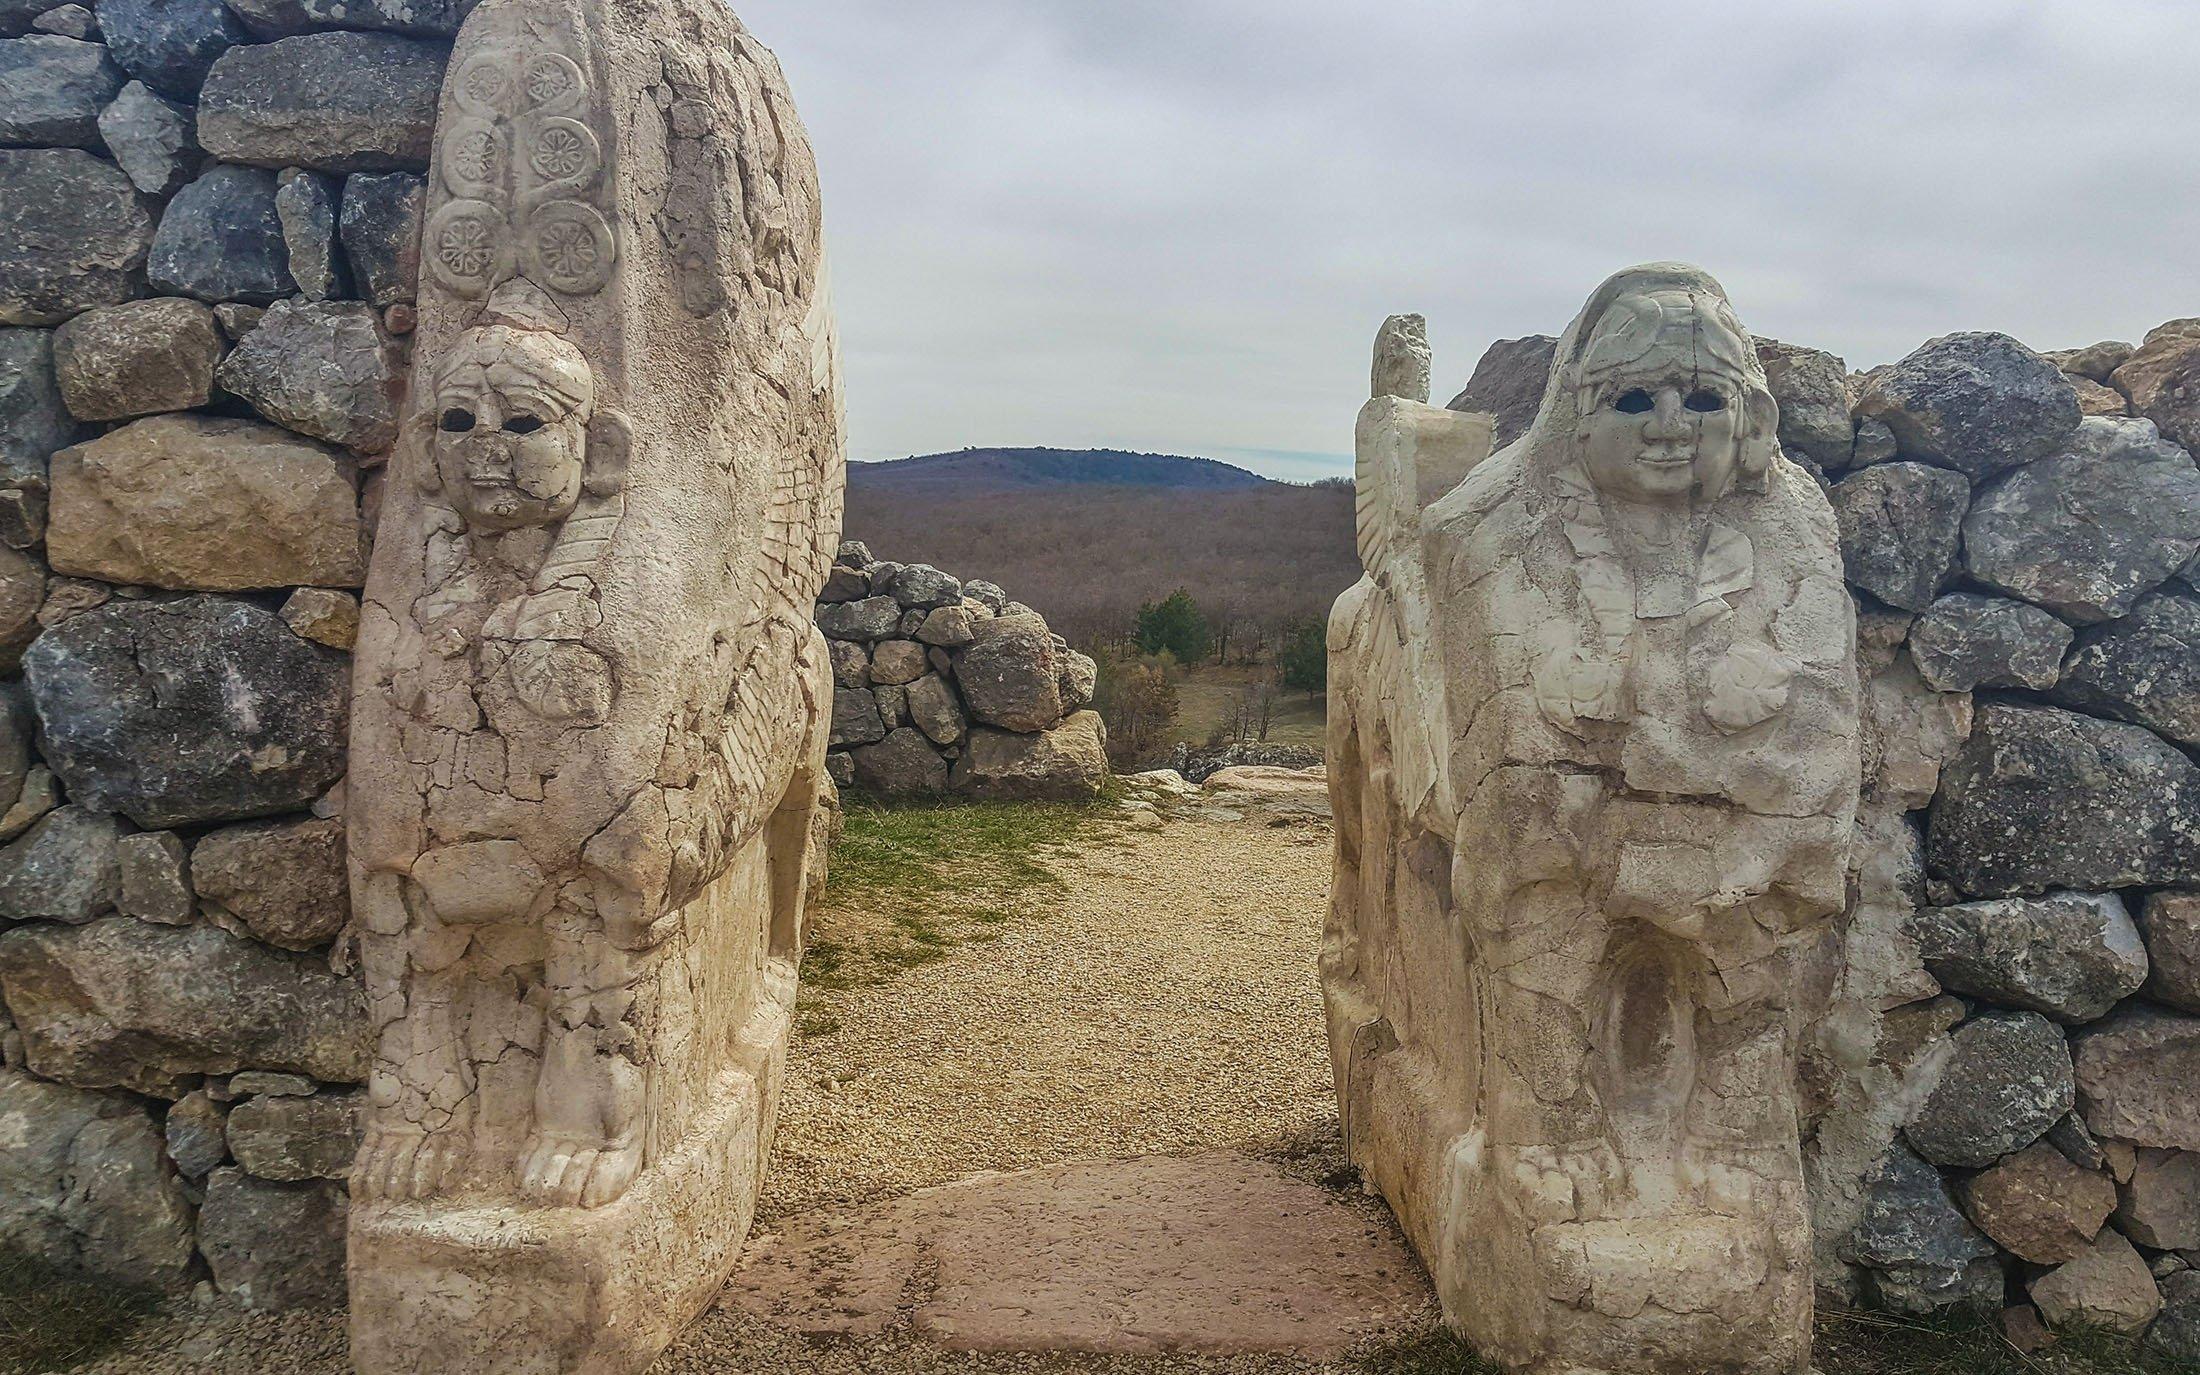 The Sphinx Gate at Hattuşa. (Photo by Argun Konuk)